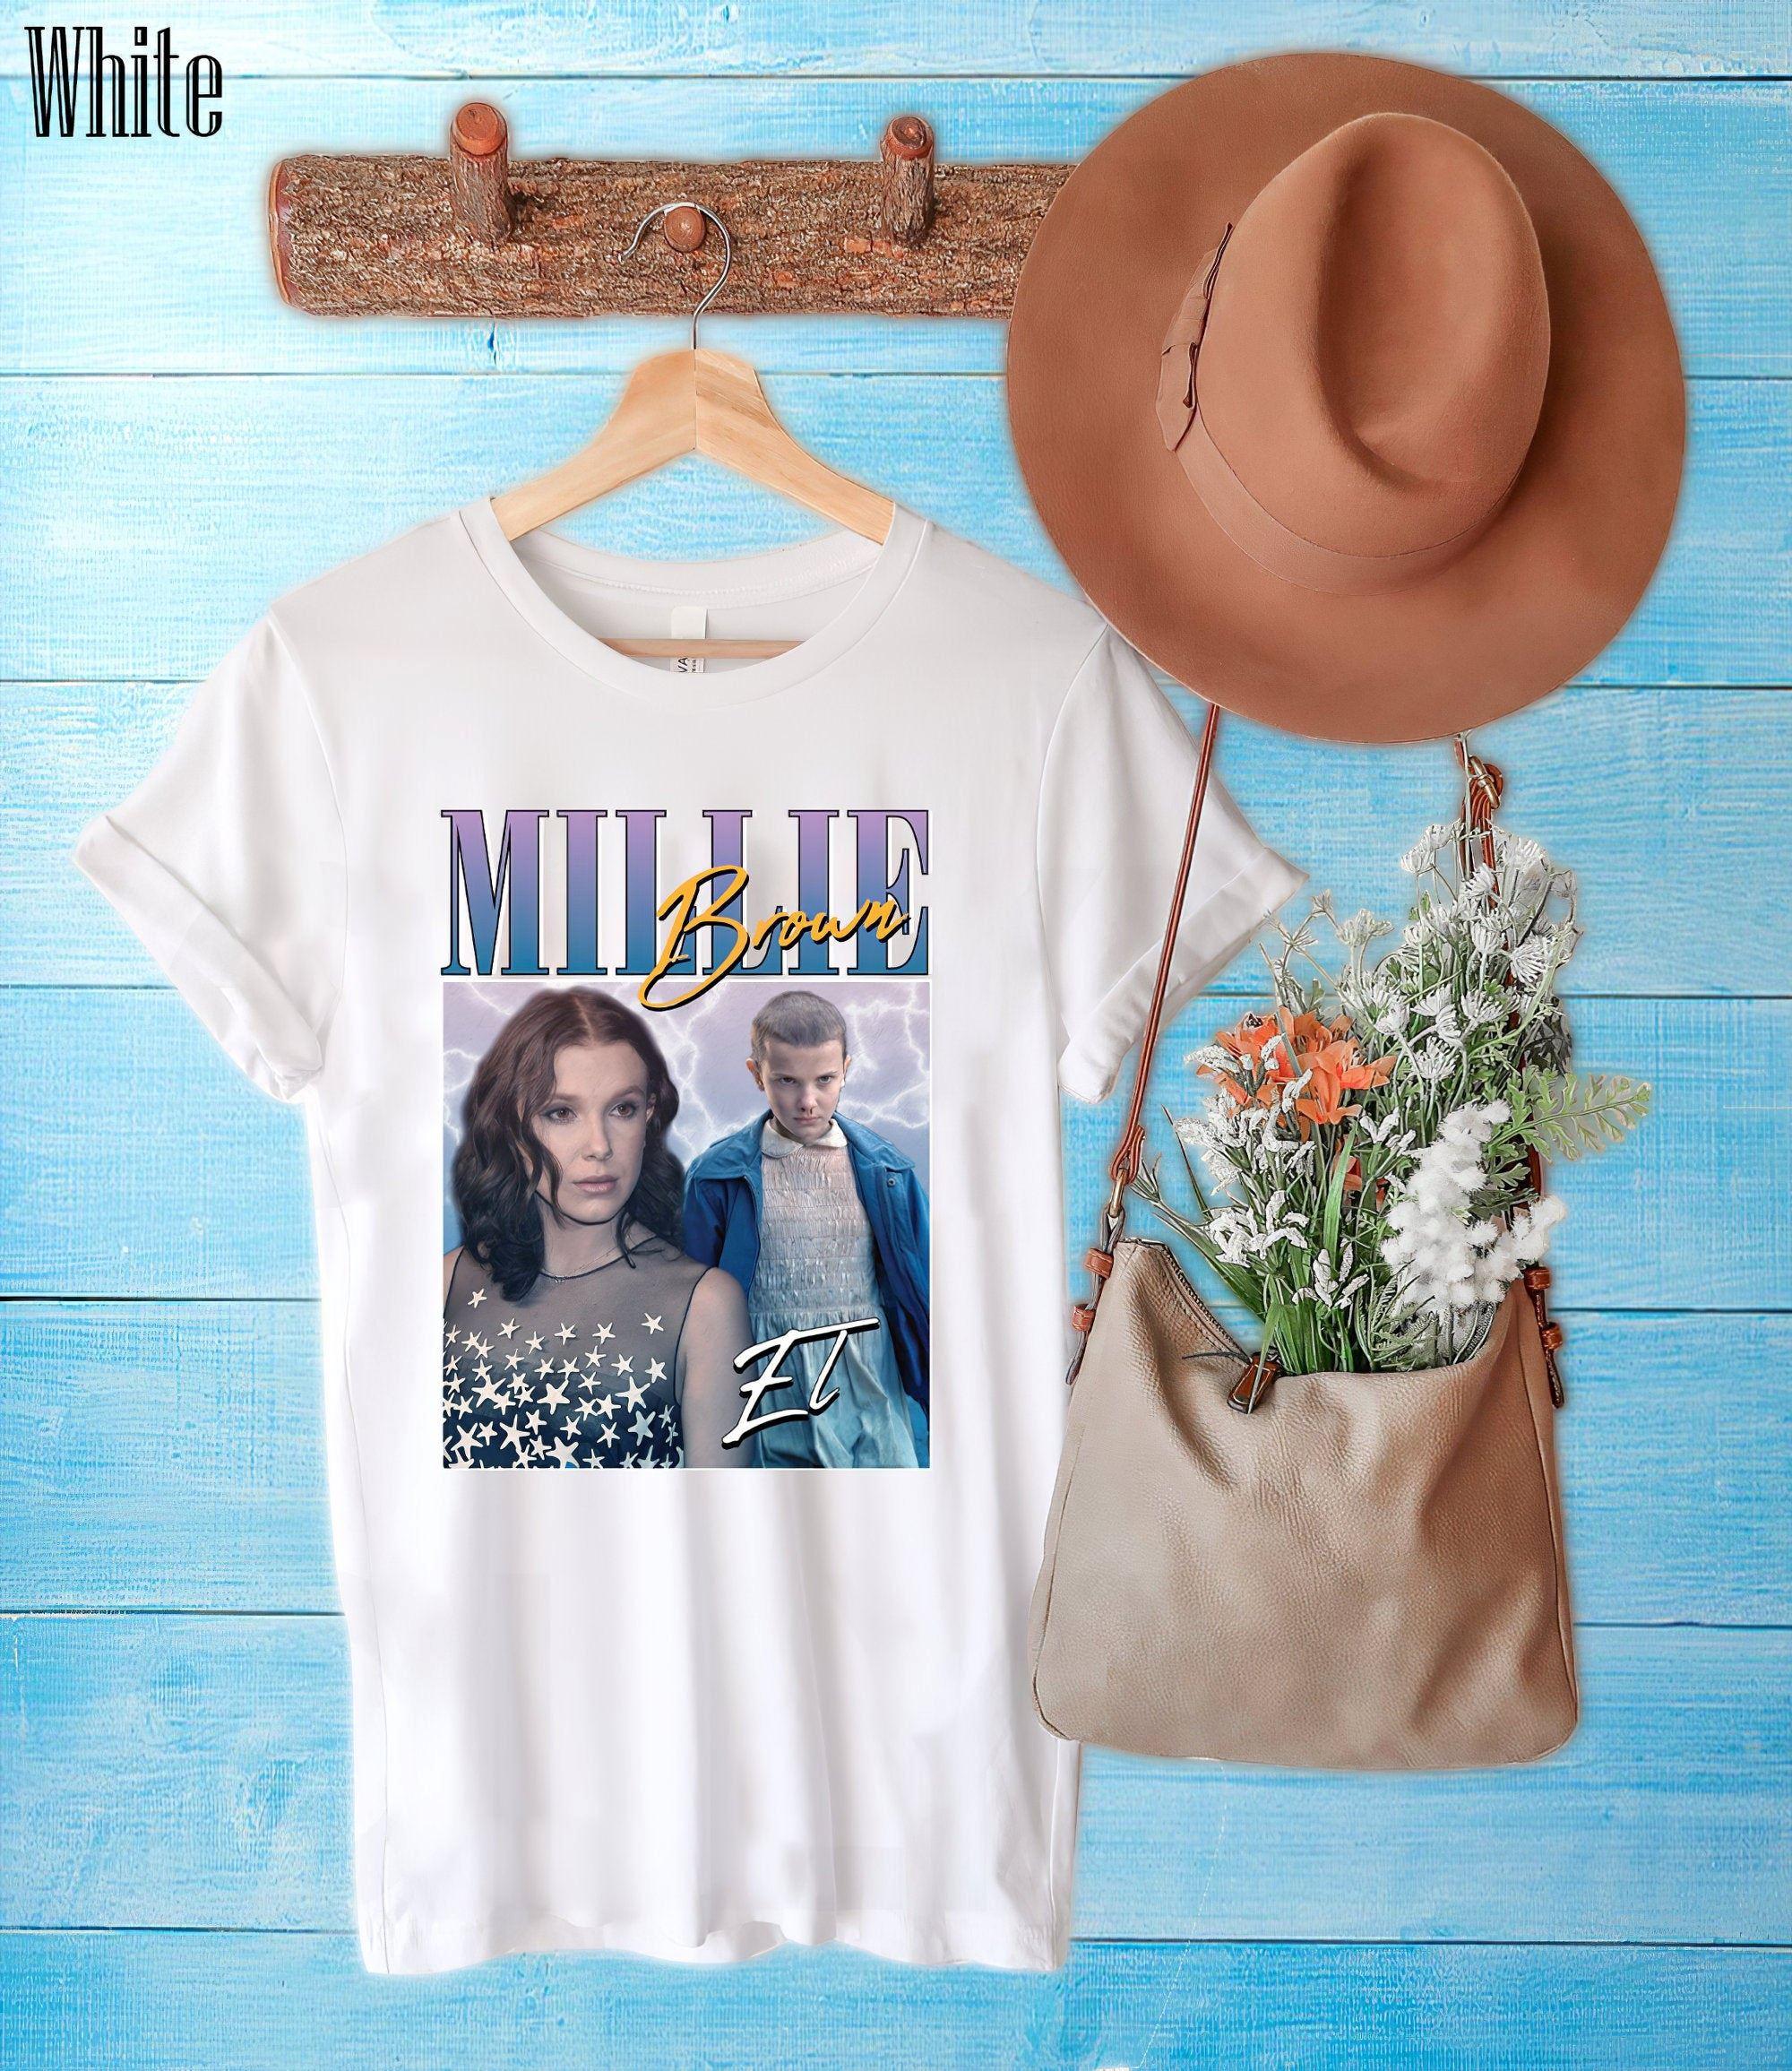 Millie Bobby Brown Rap Hip Hop Retro Vintage Shirt Stranger Things Tv Series Sweatshirt Hoodie Vintage Retro 90s Shirt